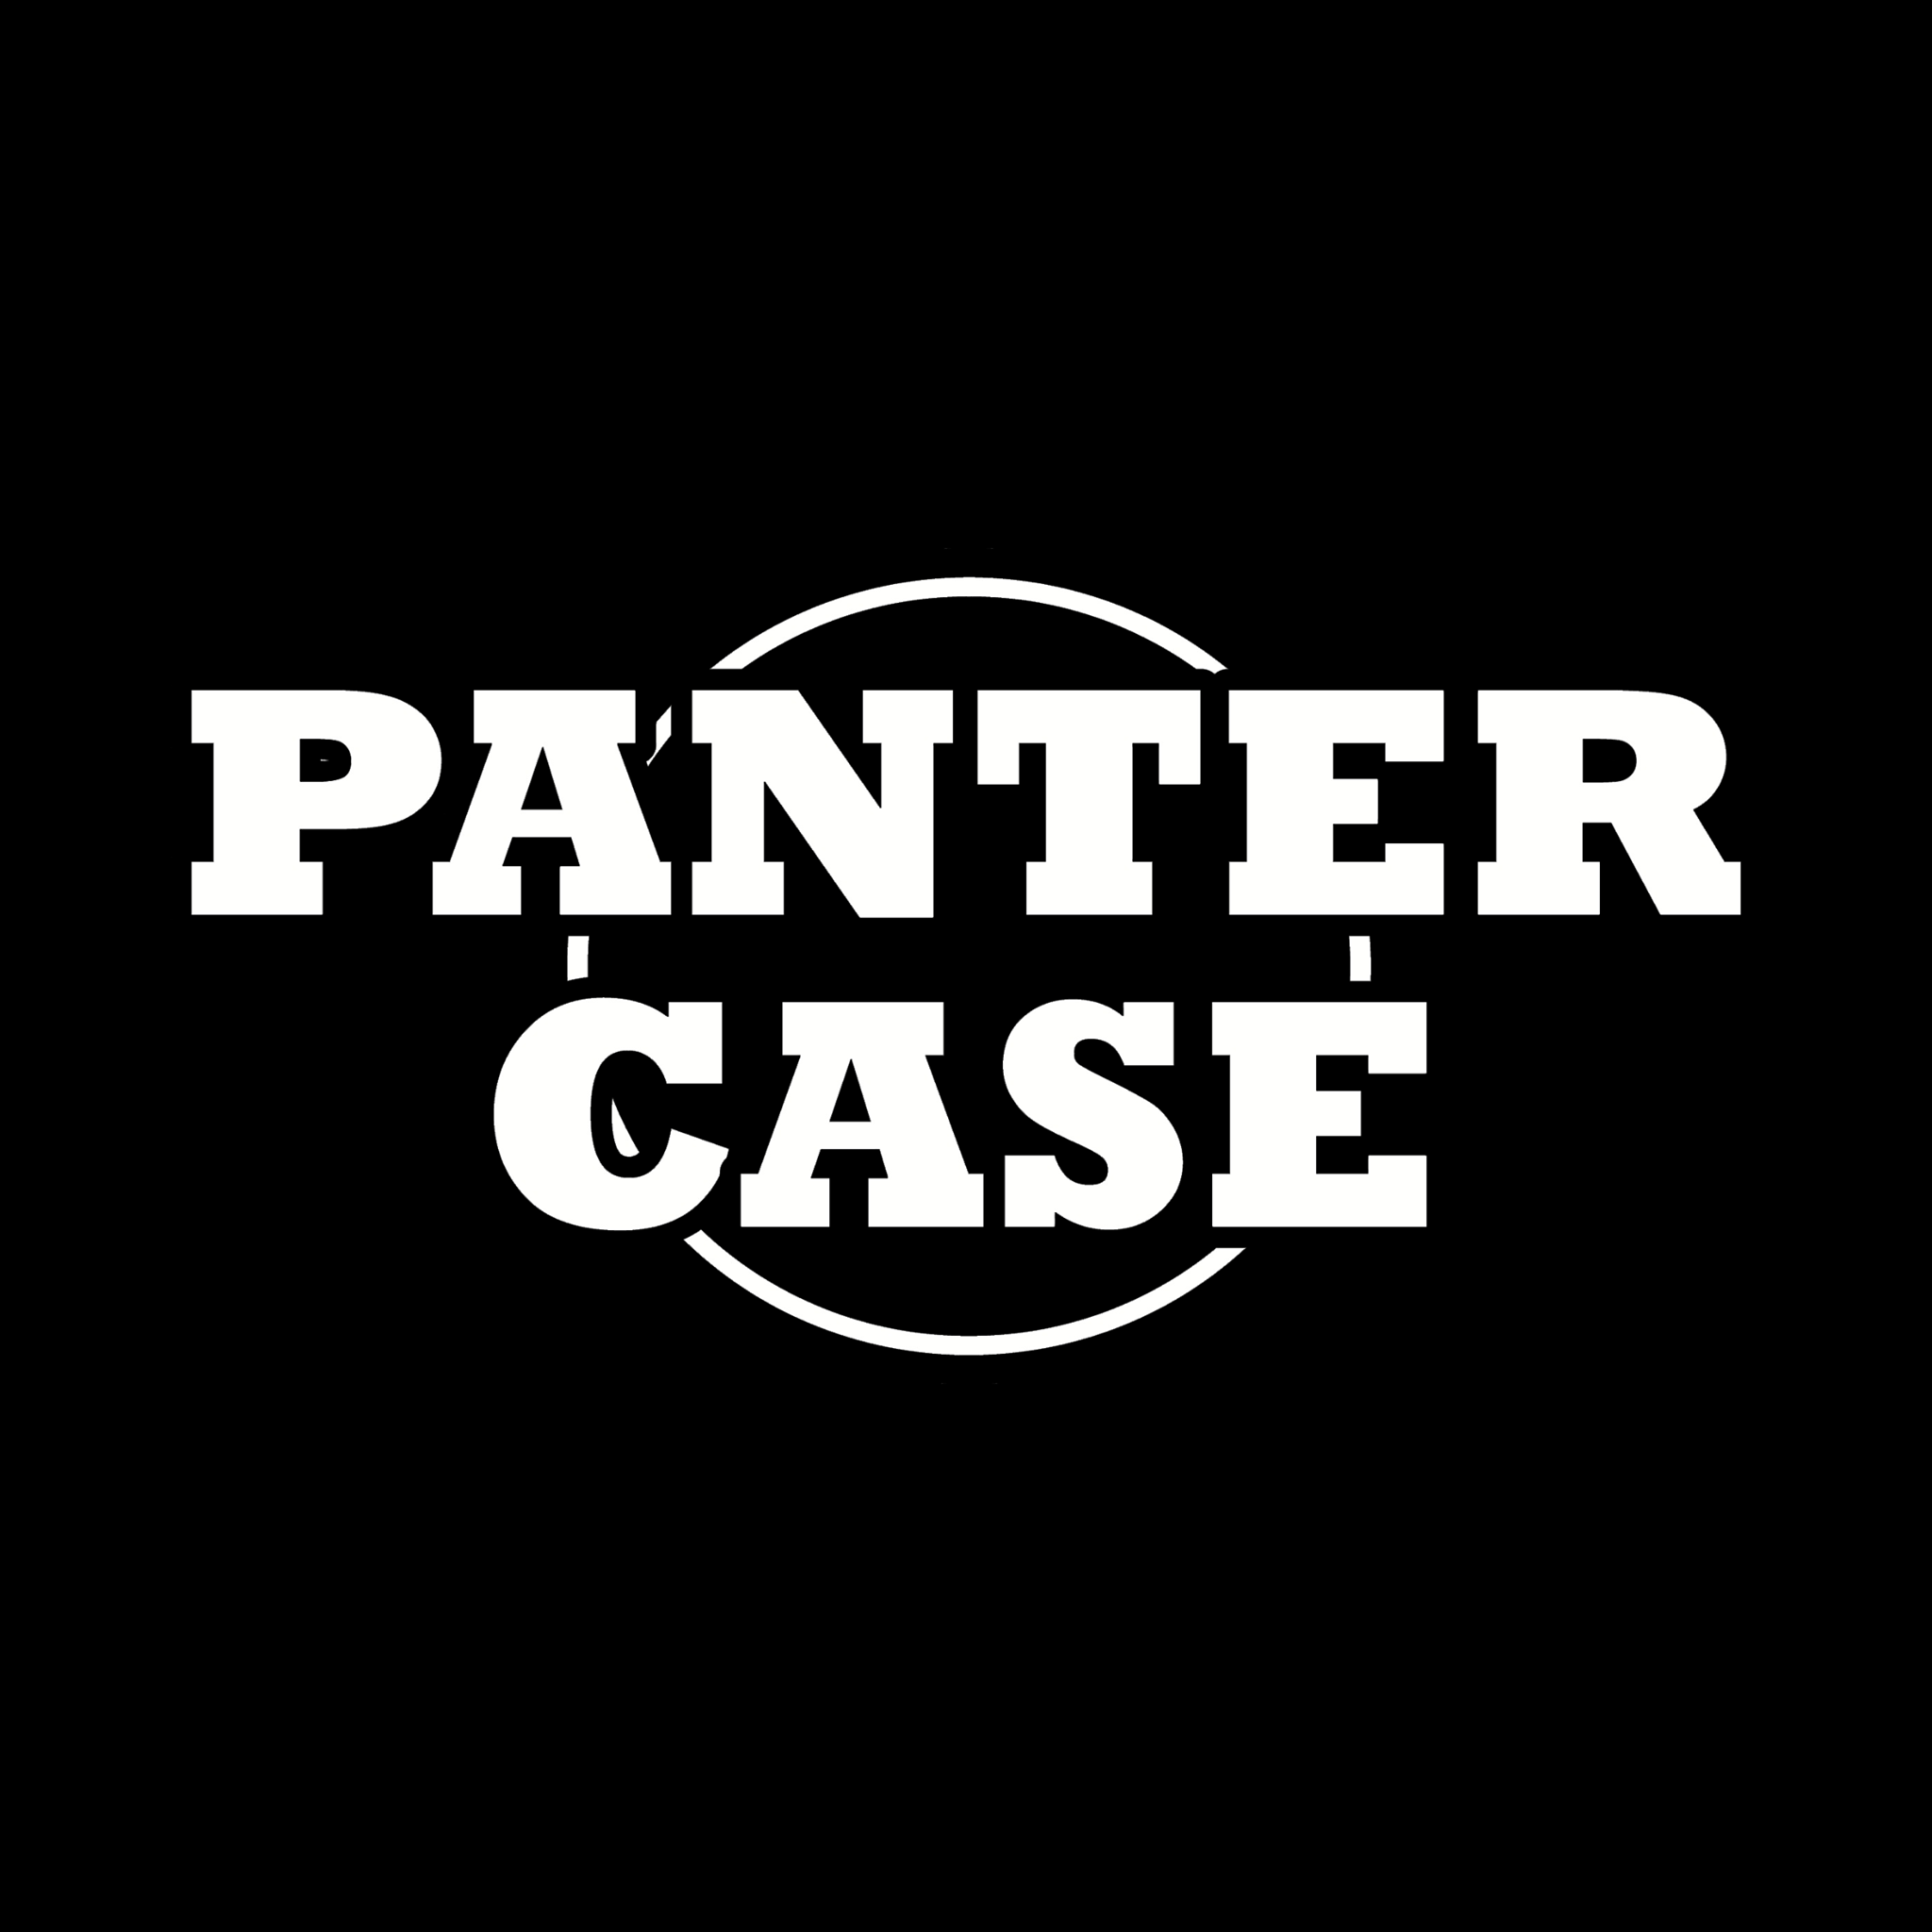 PANTER CASE